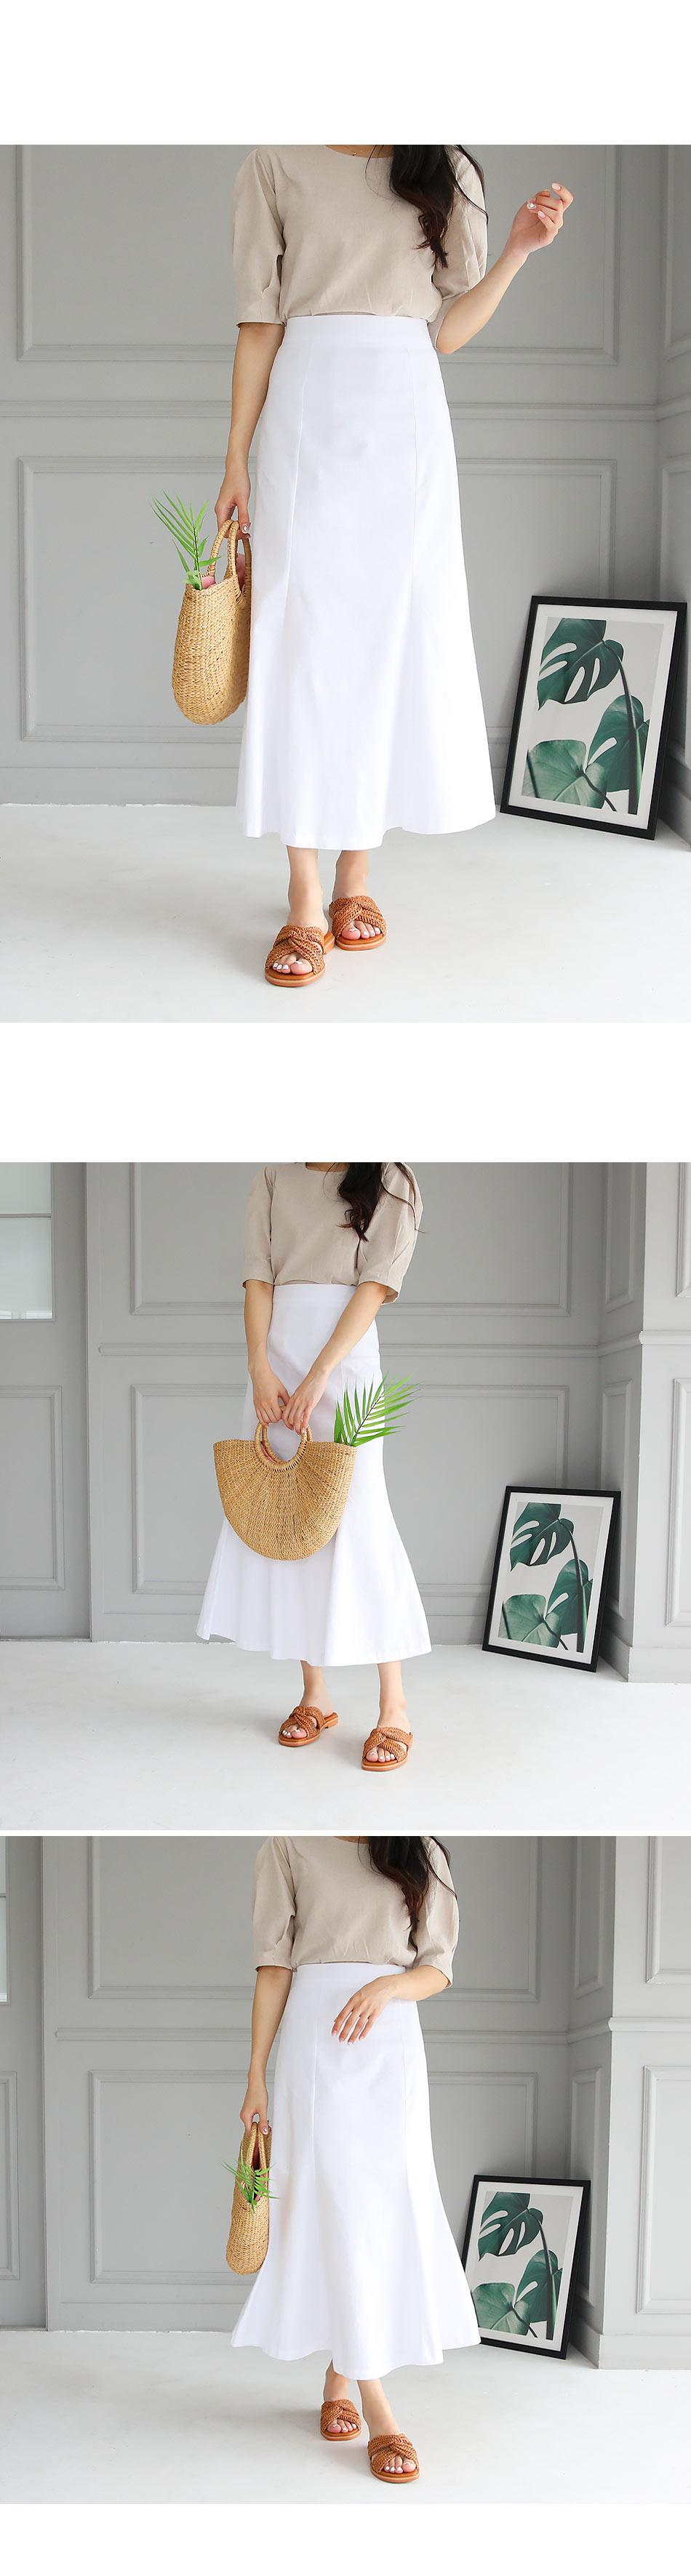 Reddins Slippers 2cm